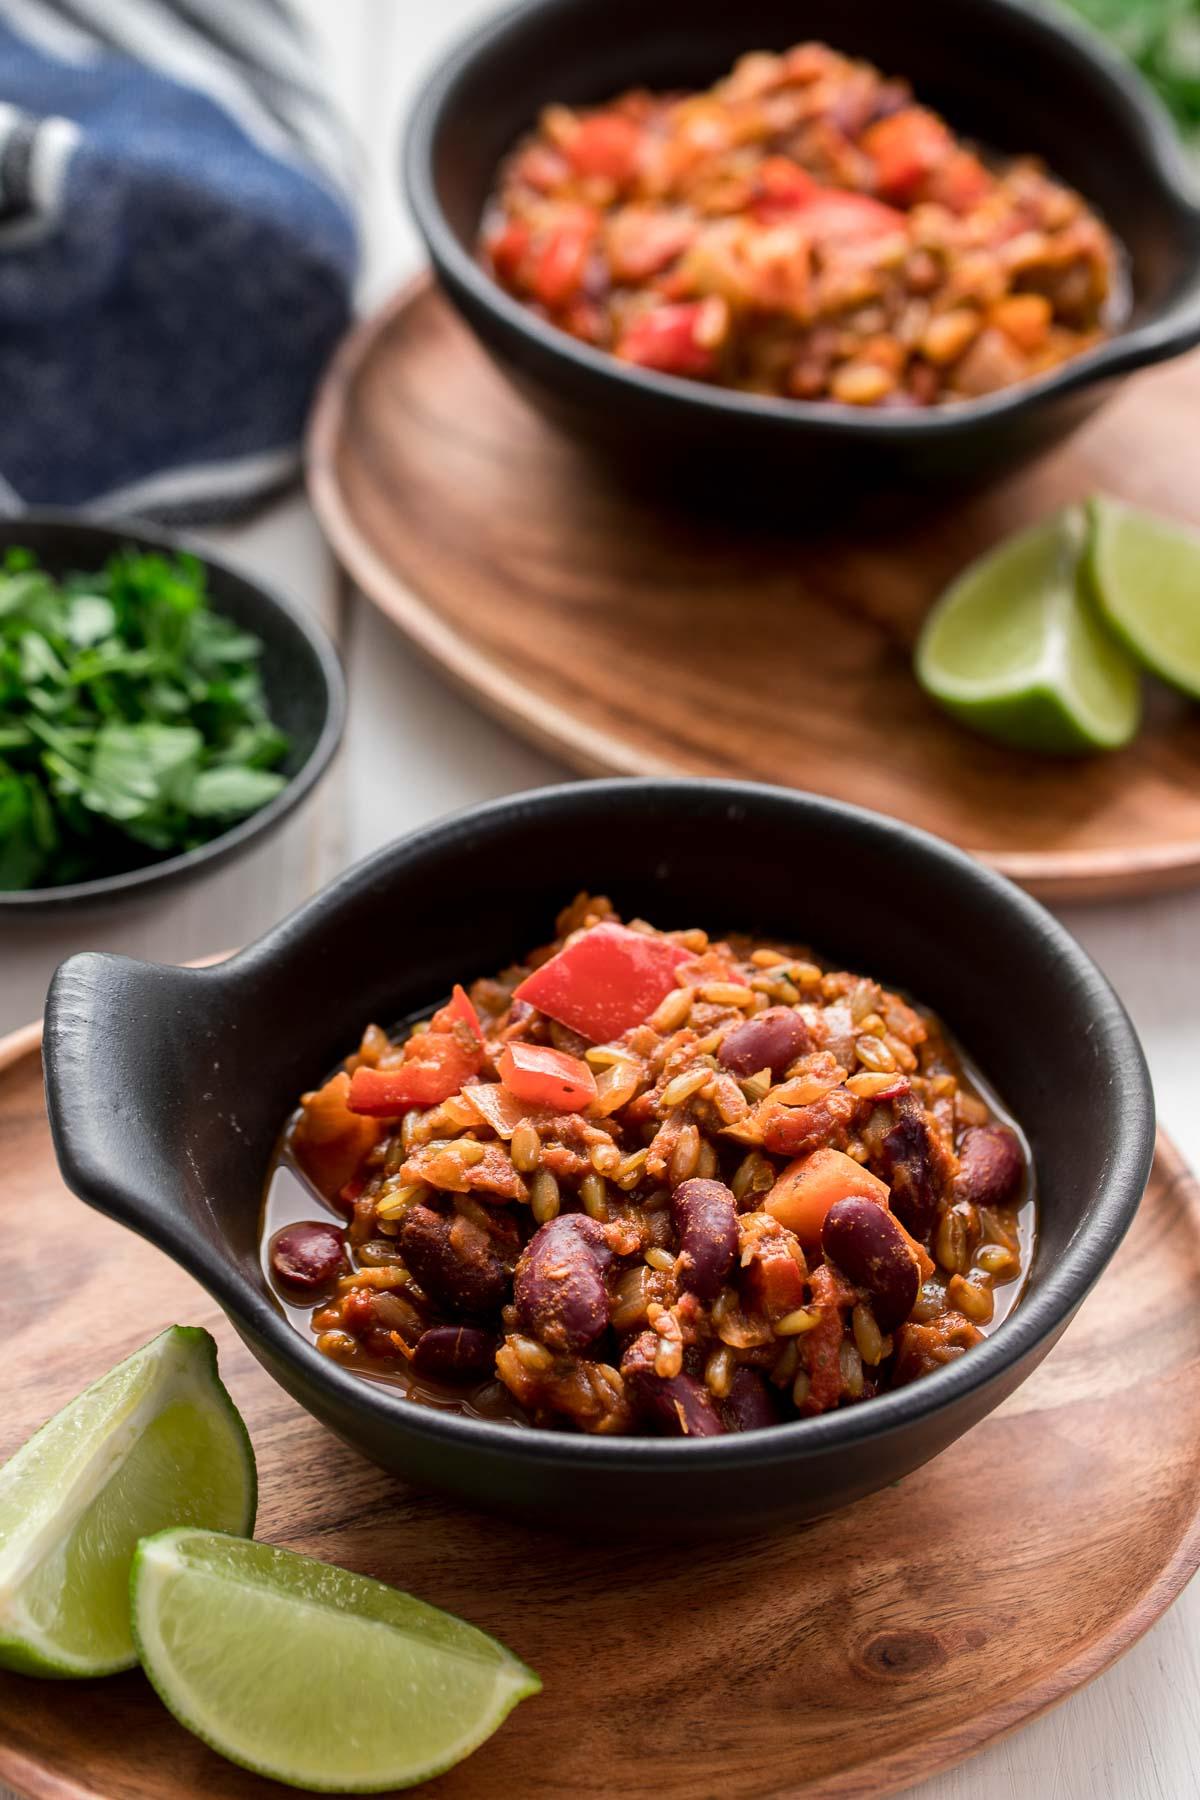 Vegetarian Chili (Chili sin Carne) with Grünkern